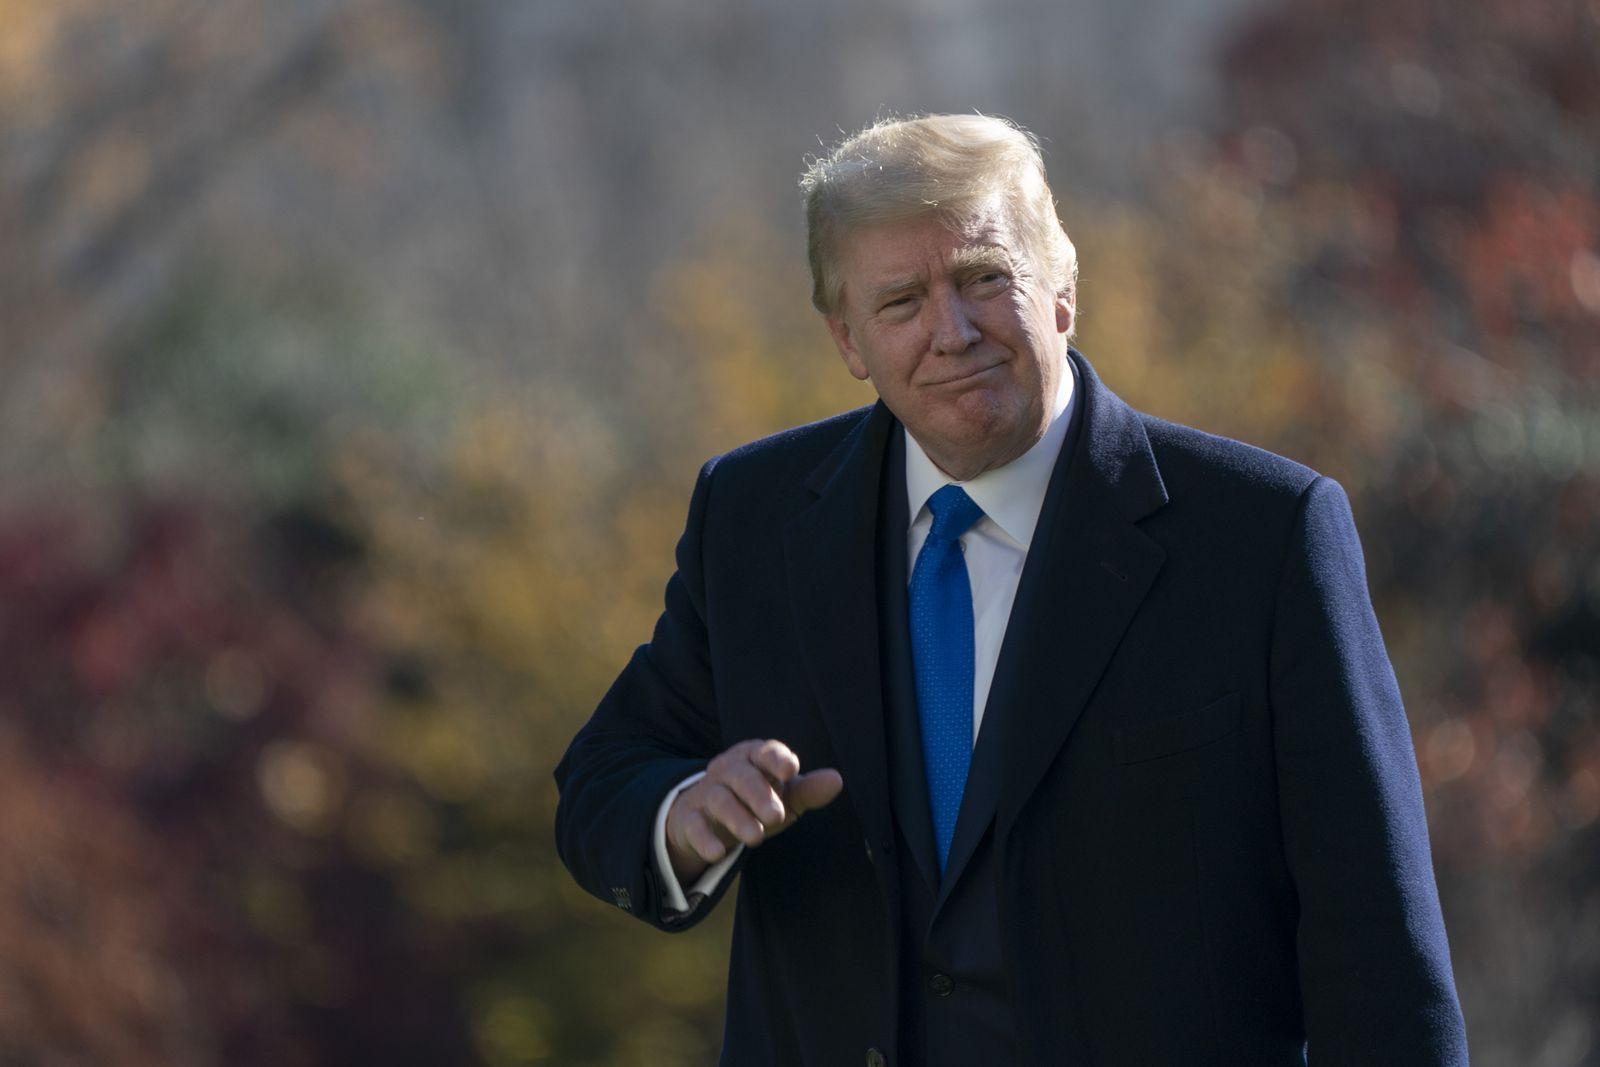 US President Donald J. Trump returns to the White House, Washington, USA - 29 Nov 2020